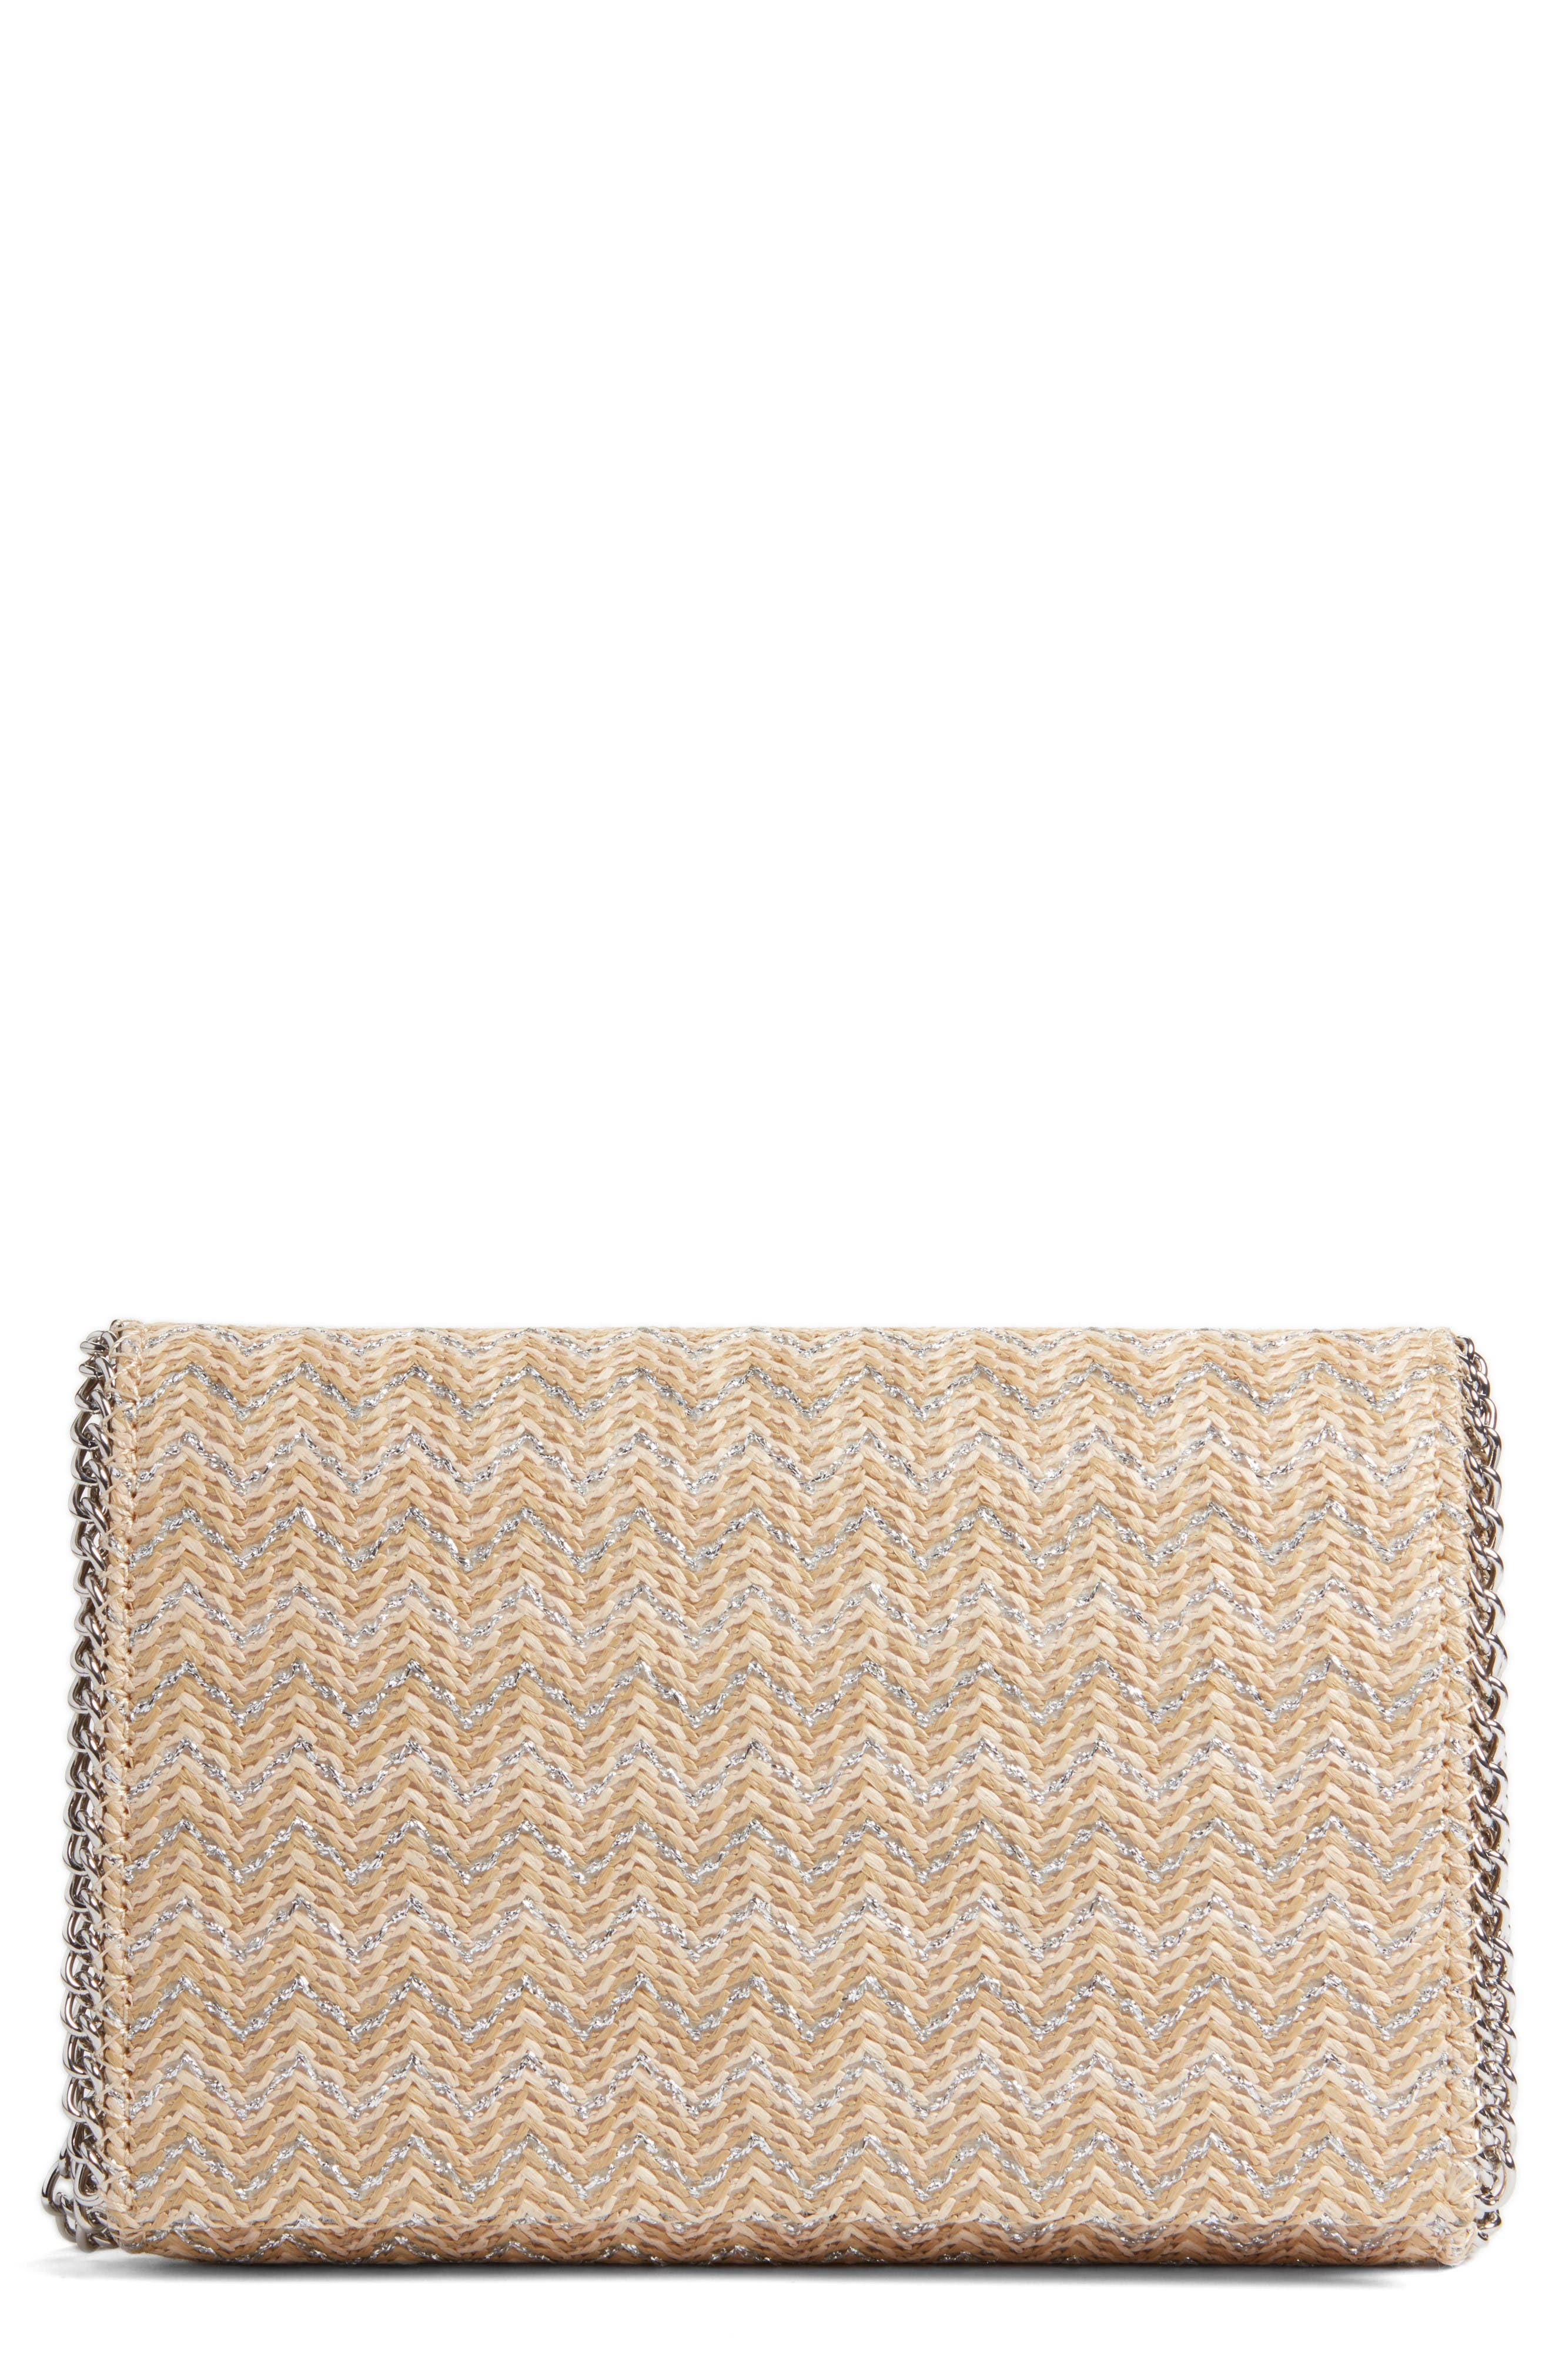 Stripe Straw Convertible Clutch,                             Main thumbnail 1, color,                             Natural- Silver Chevron